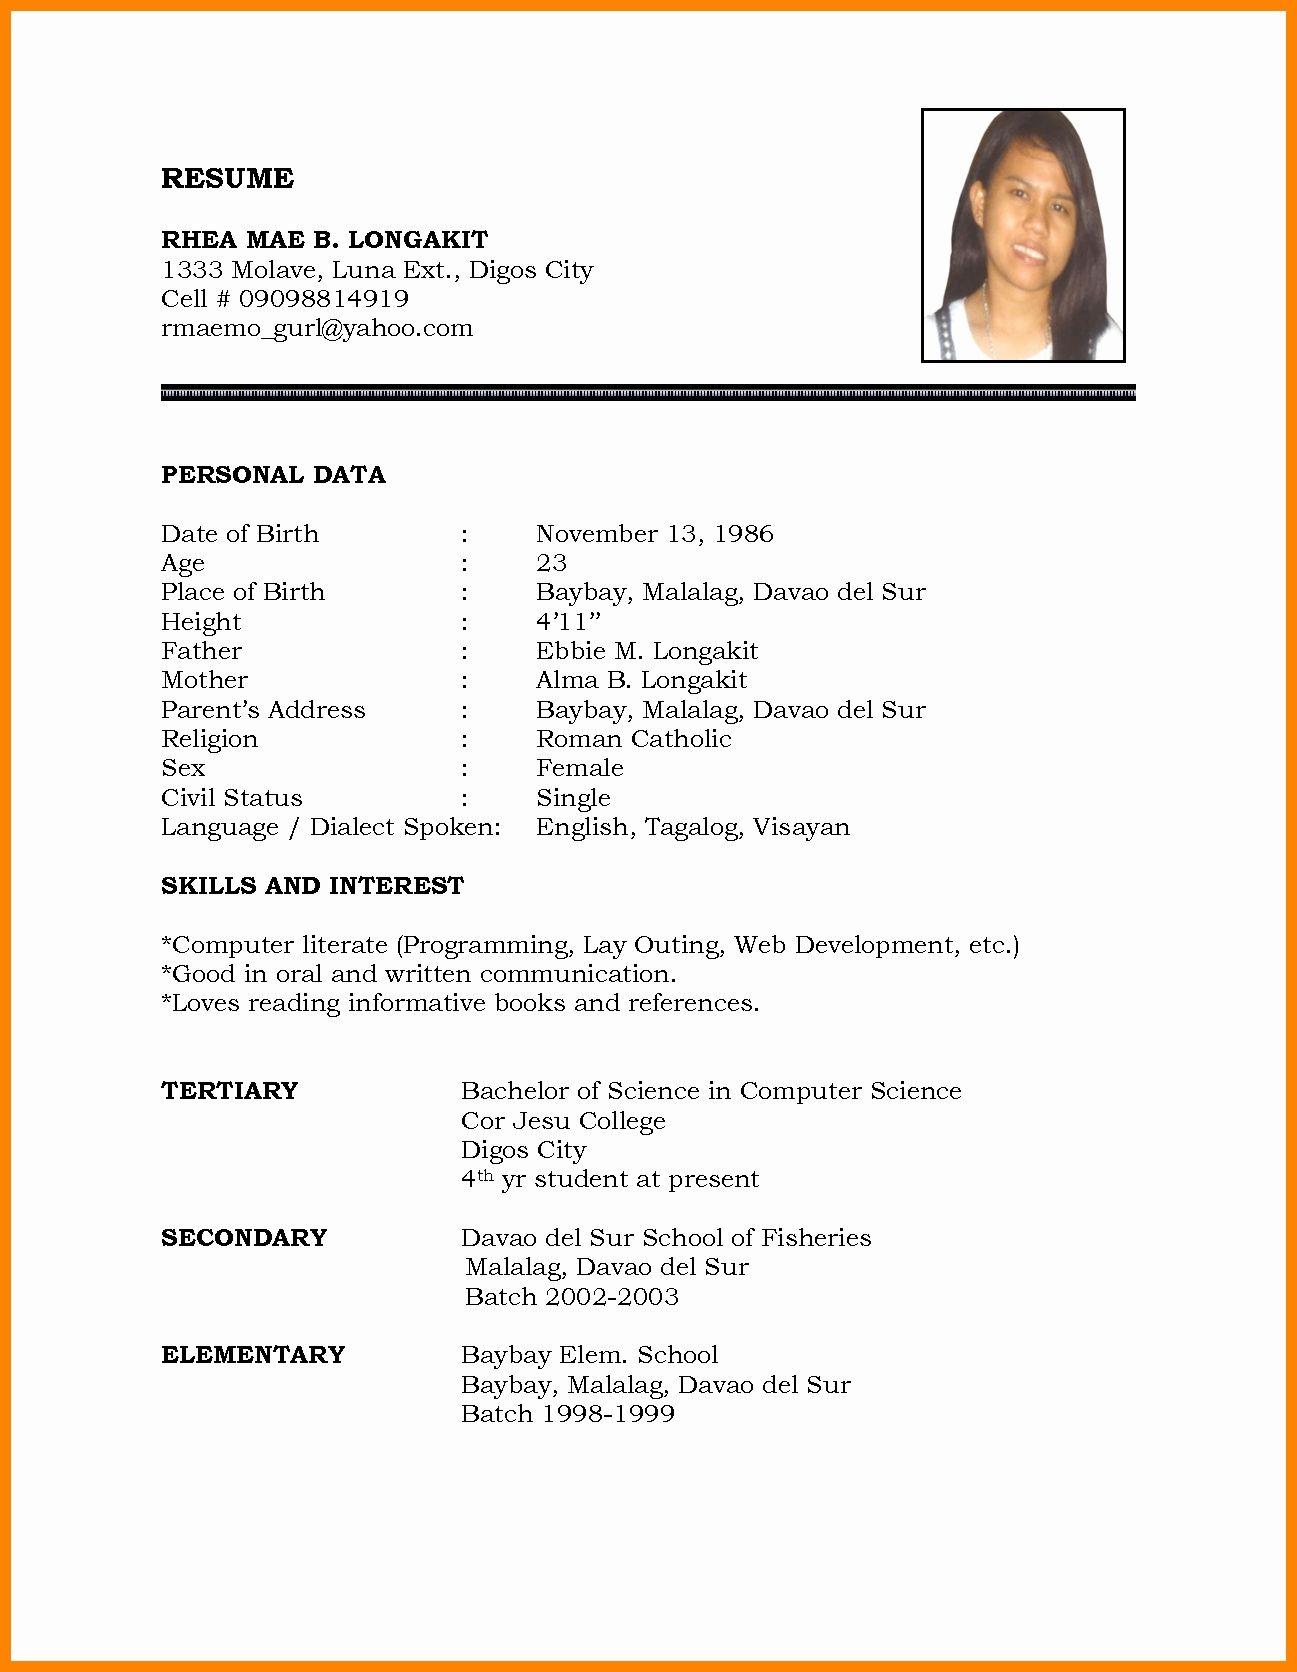 Gujarat Job resume format, Job resume template, Simple